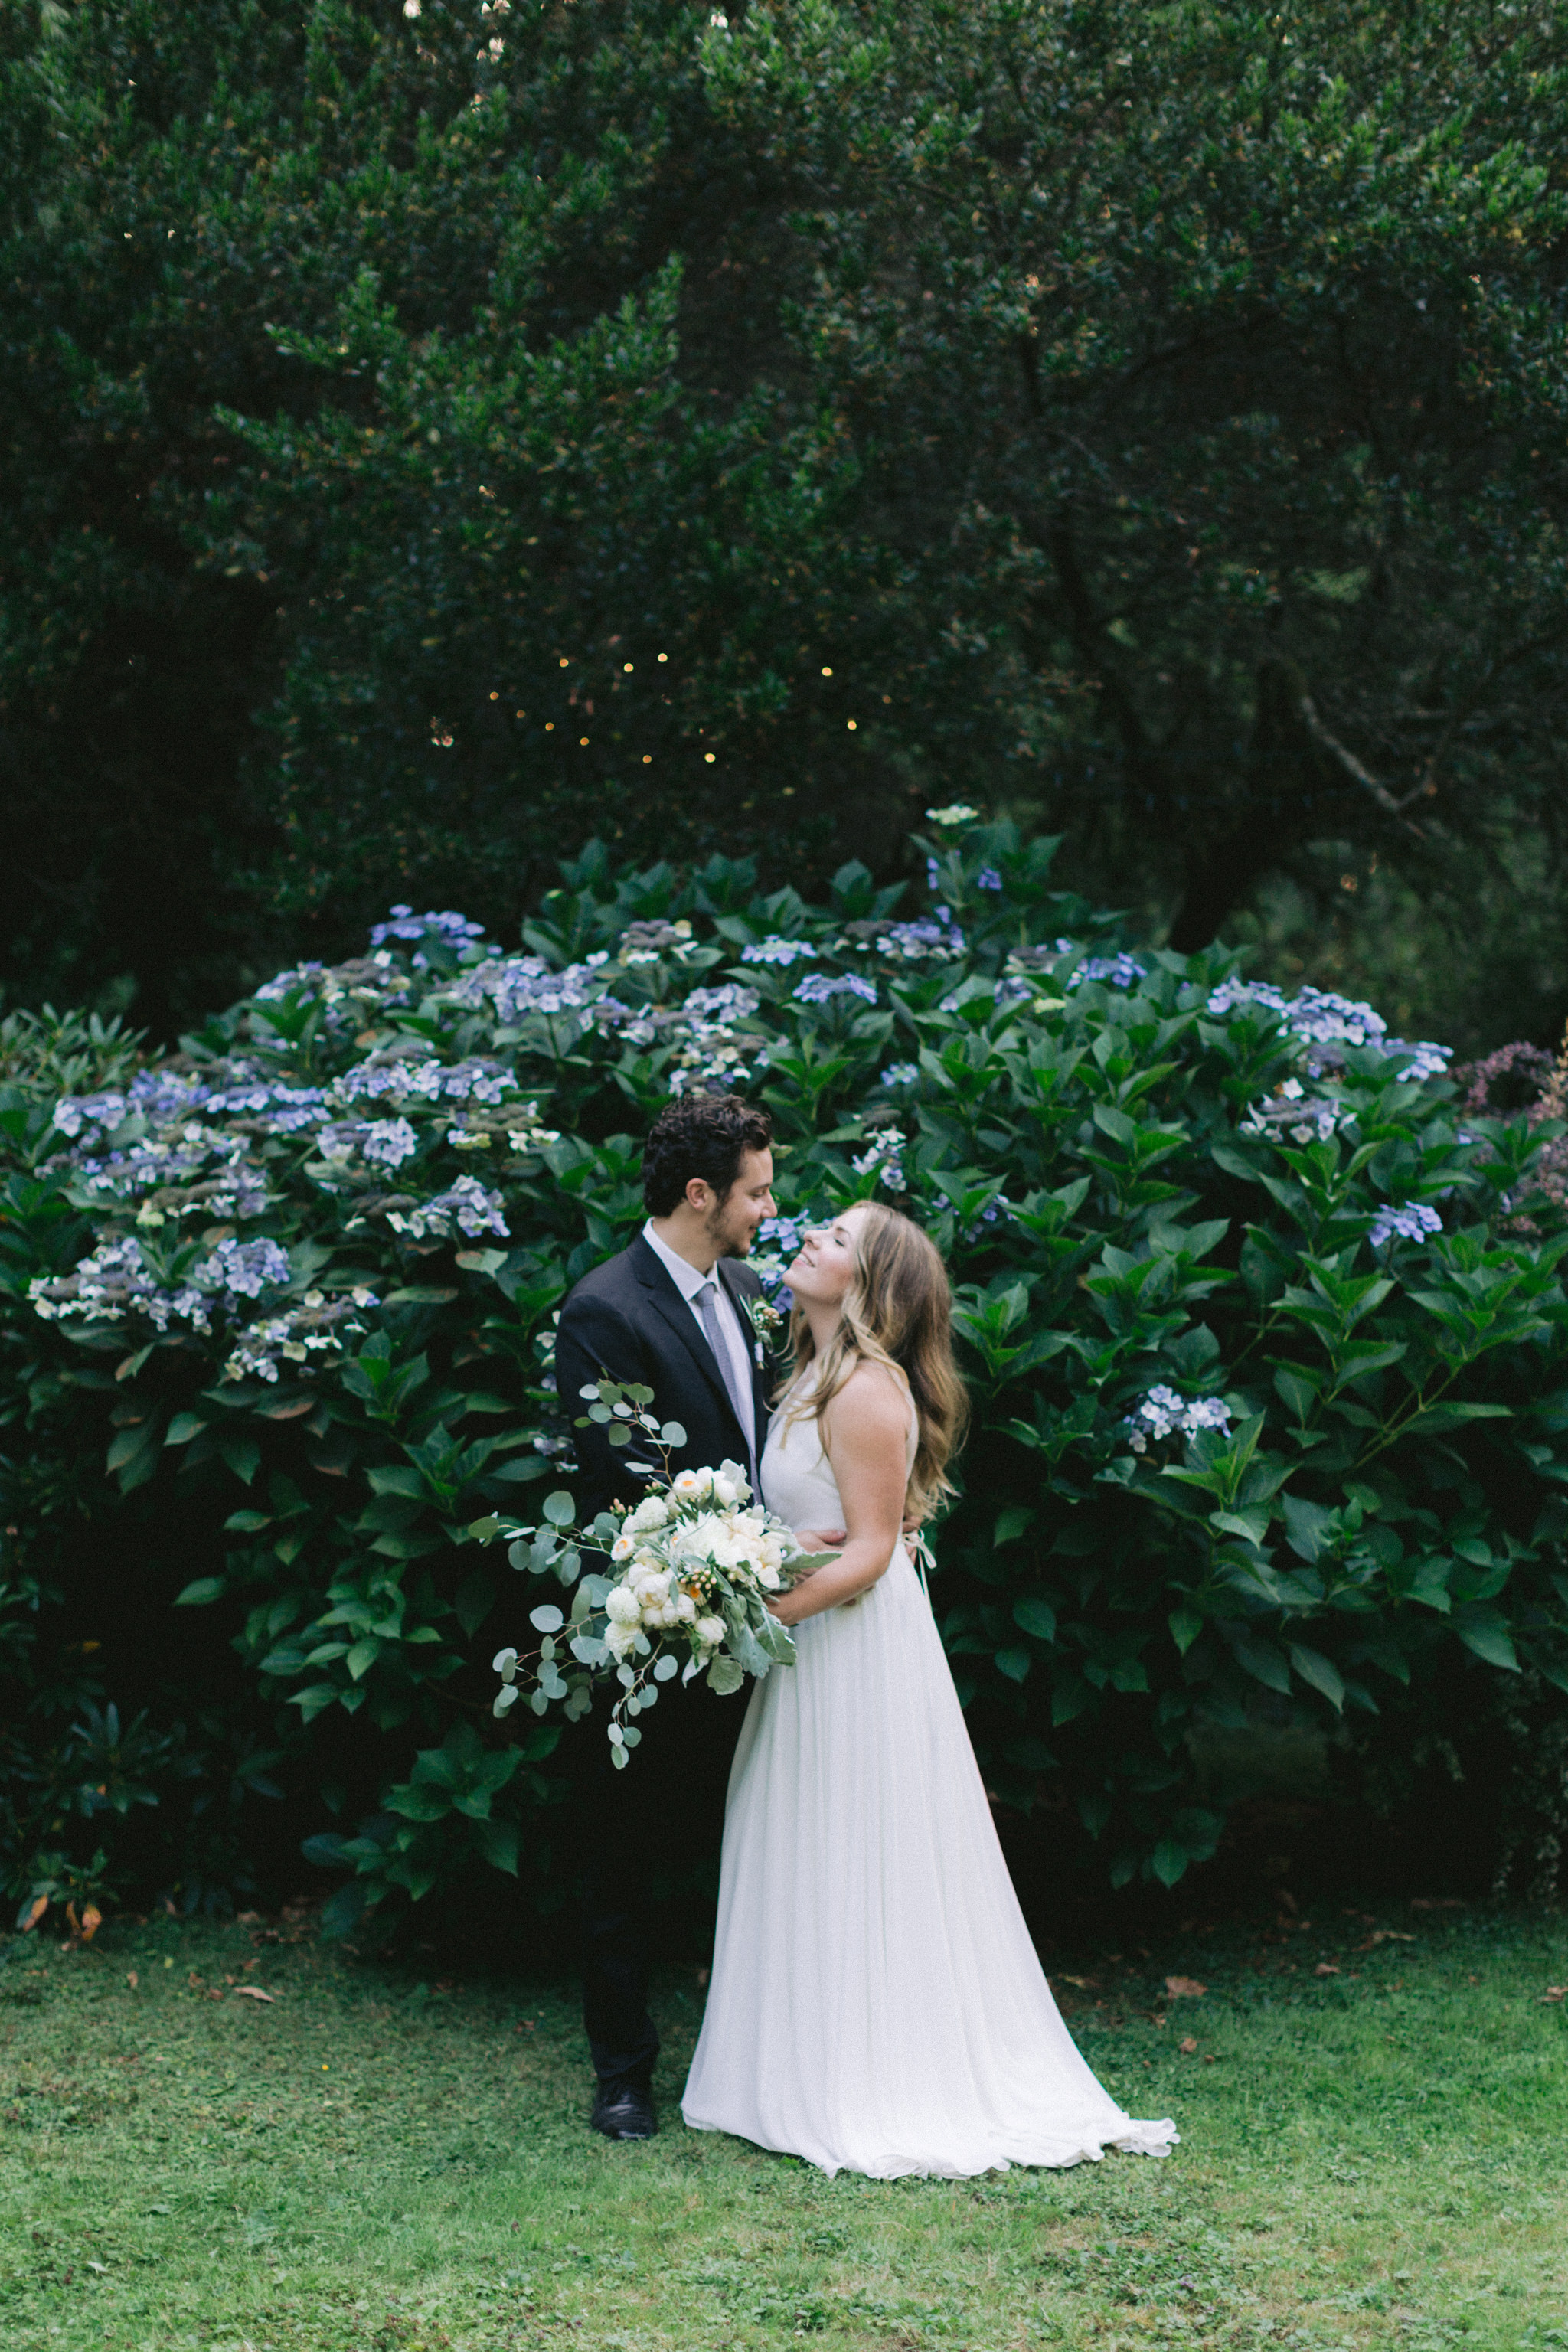 Backyard-Bainbridge-Island-Wedding-Alycia-Lovell-Photography-171.JPG